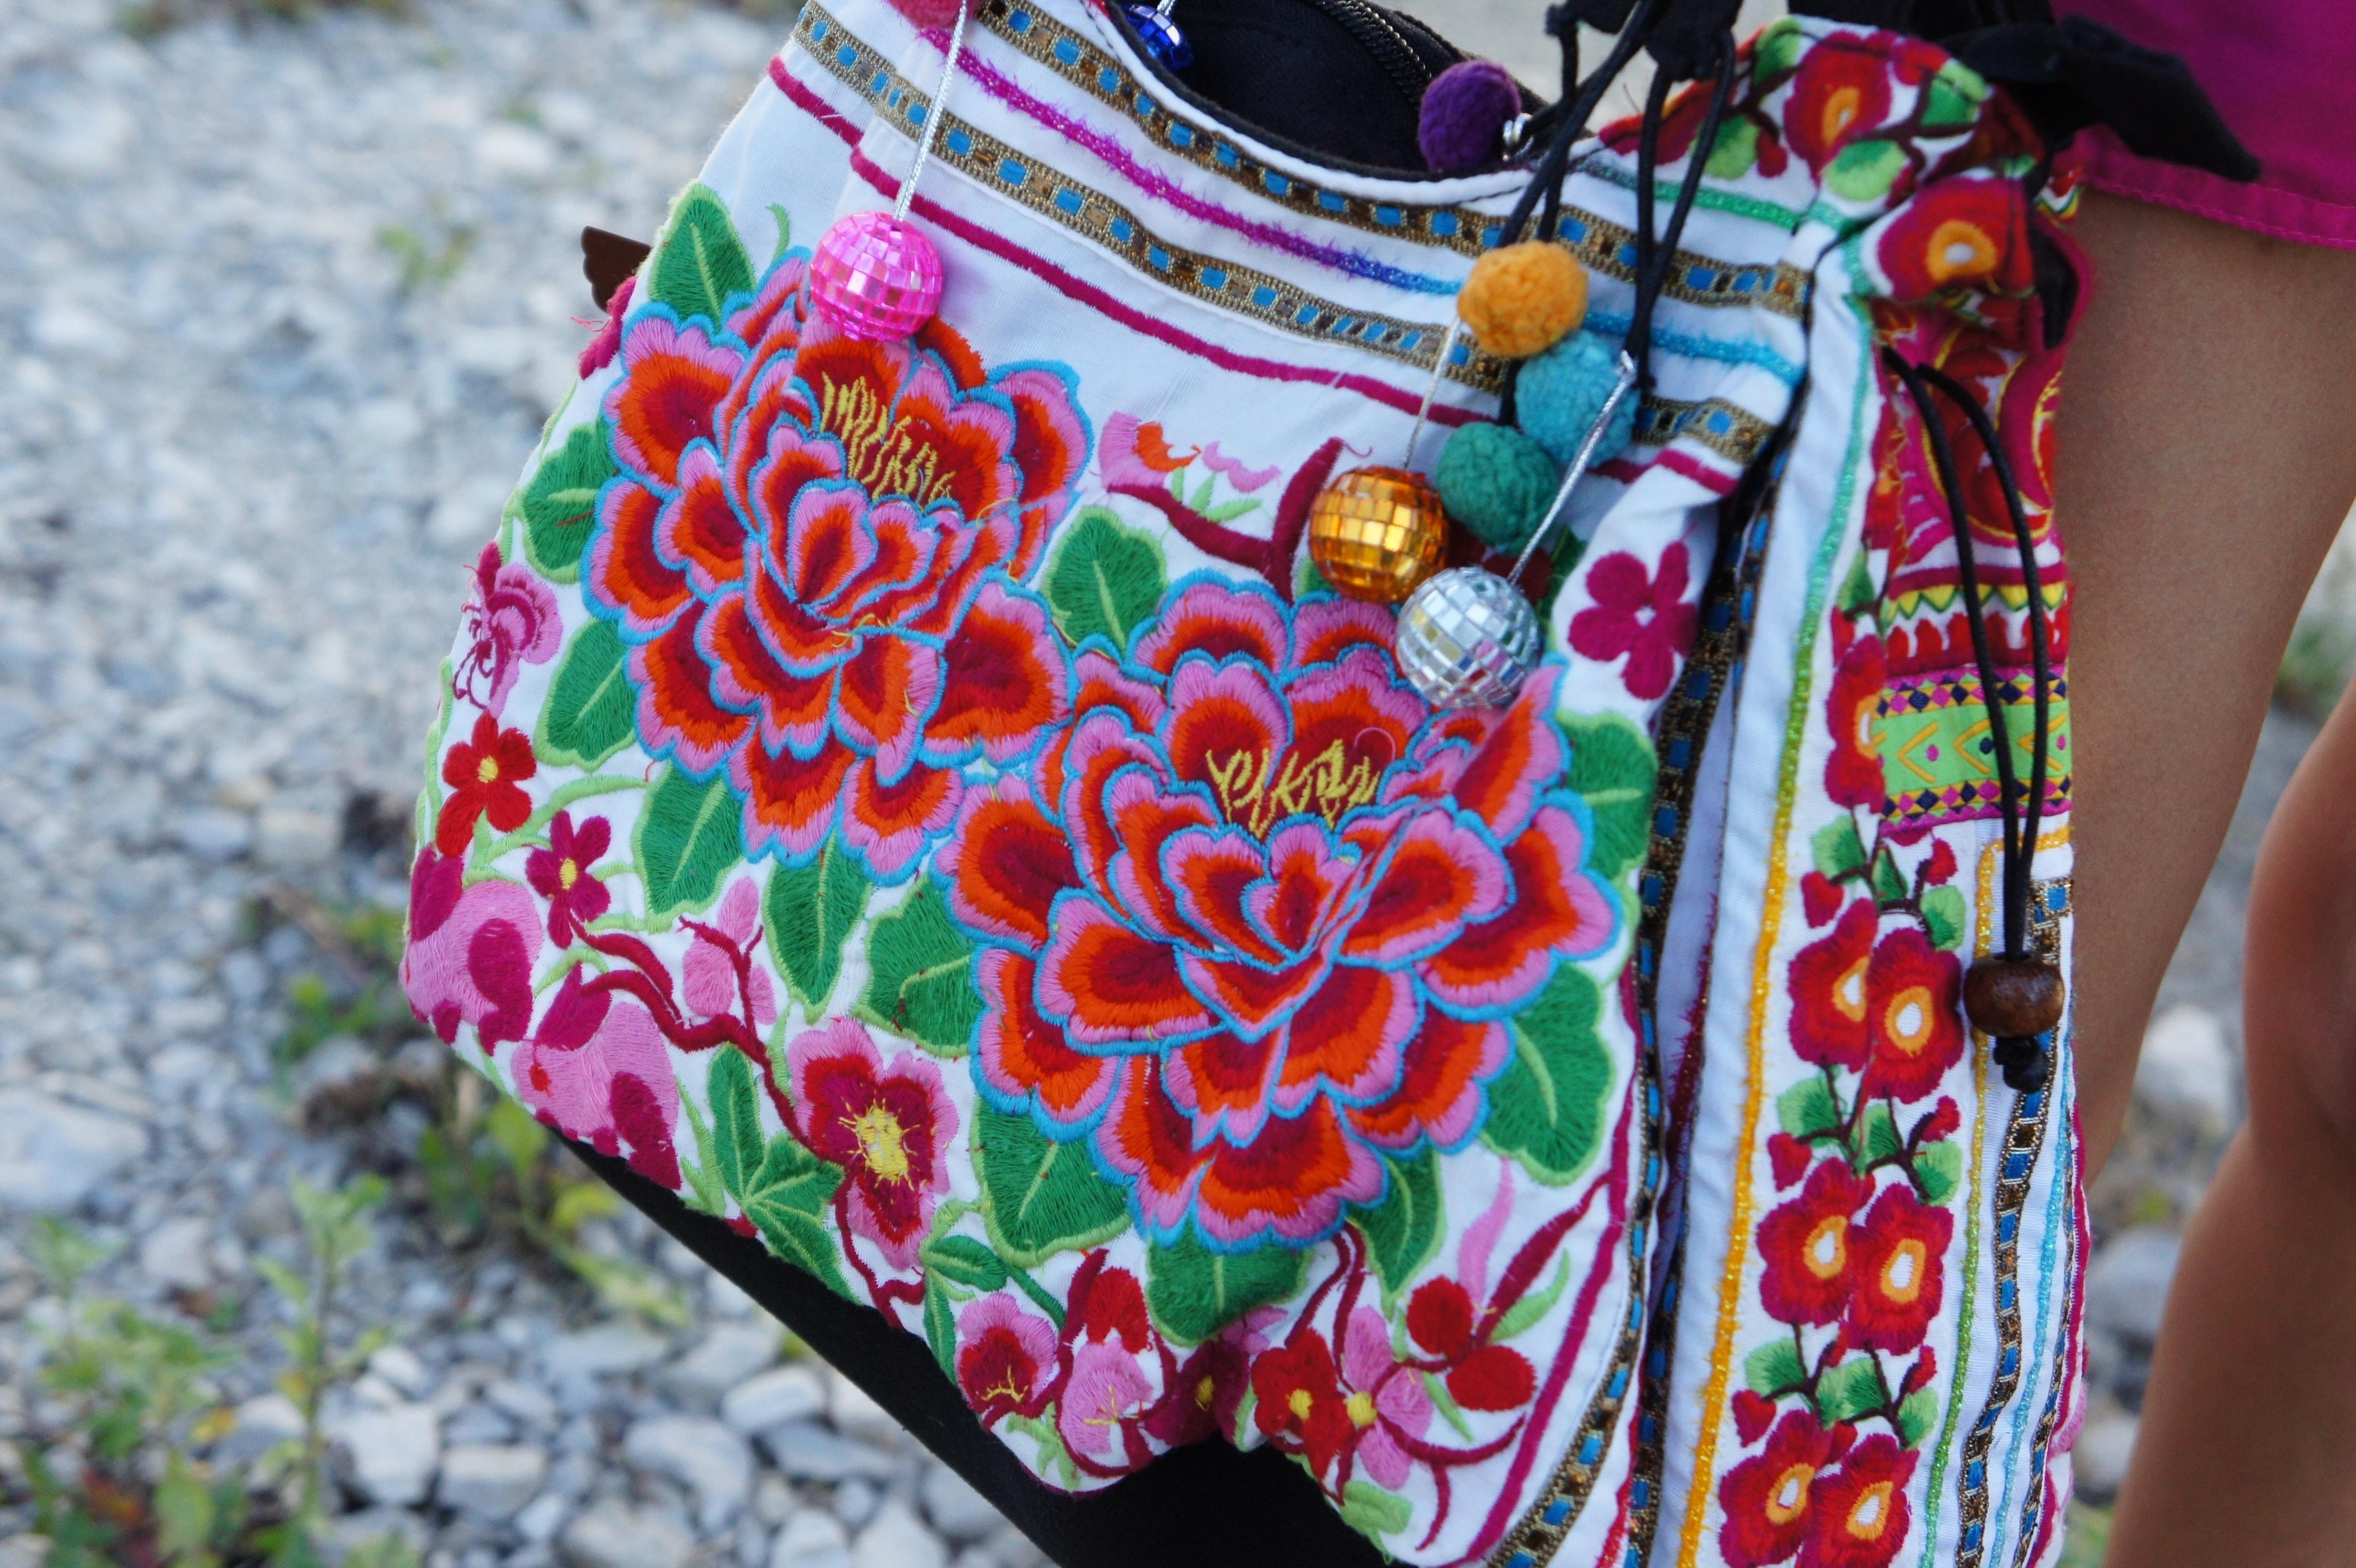 Free Images Flower Floral Pattern Spring Color Clothing